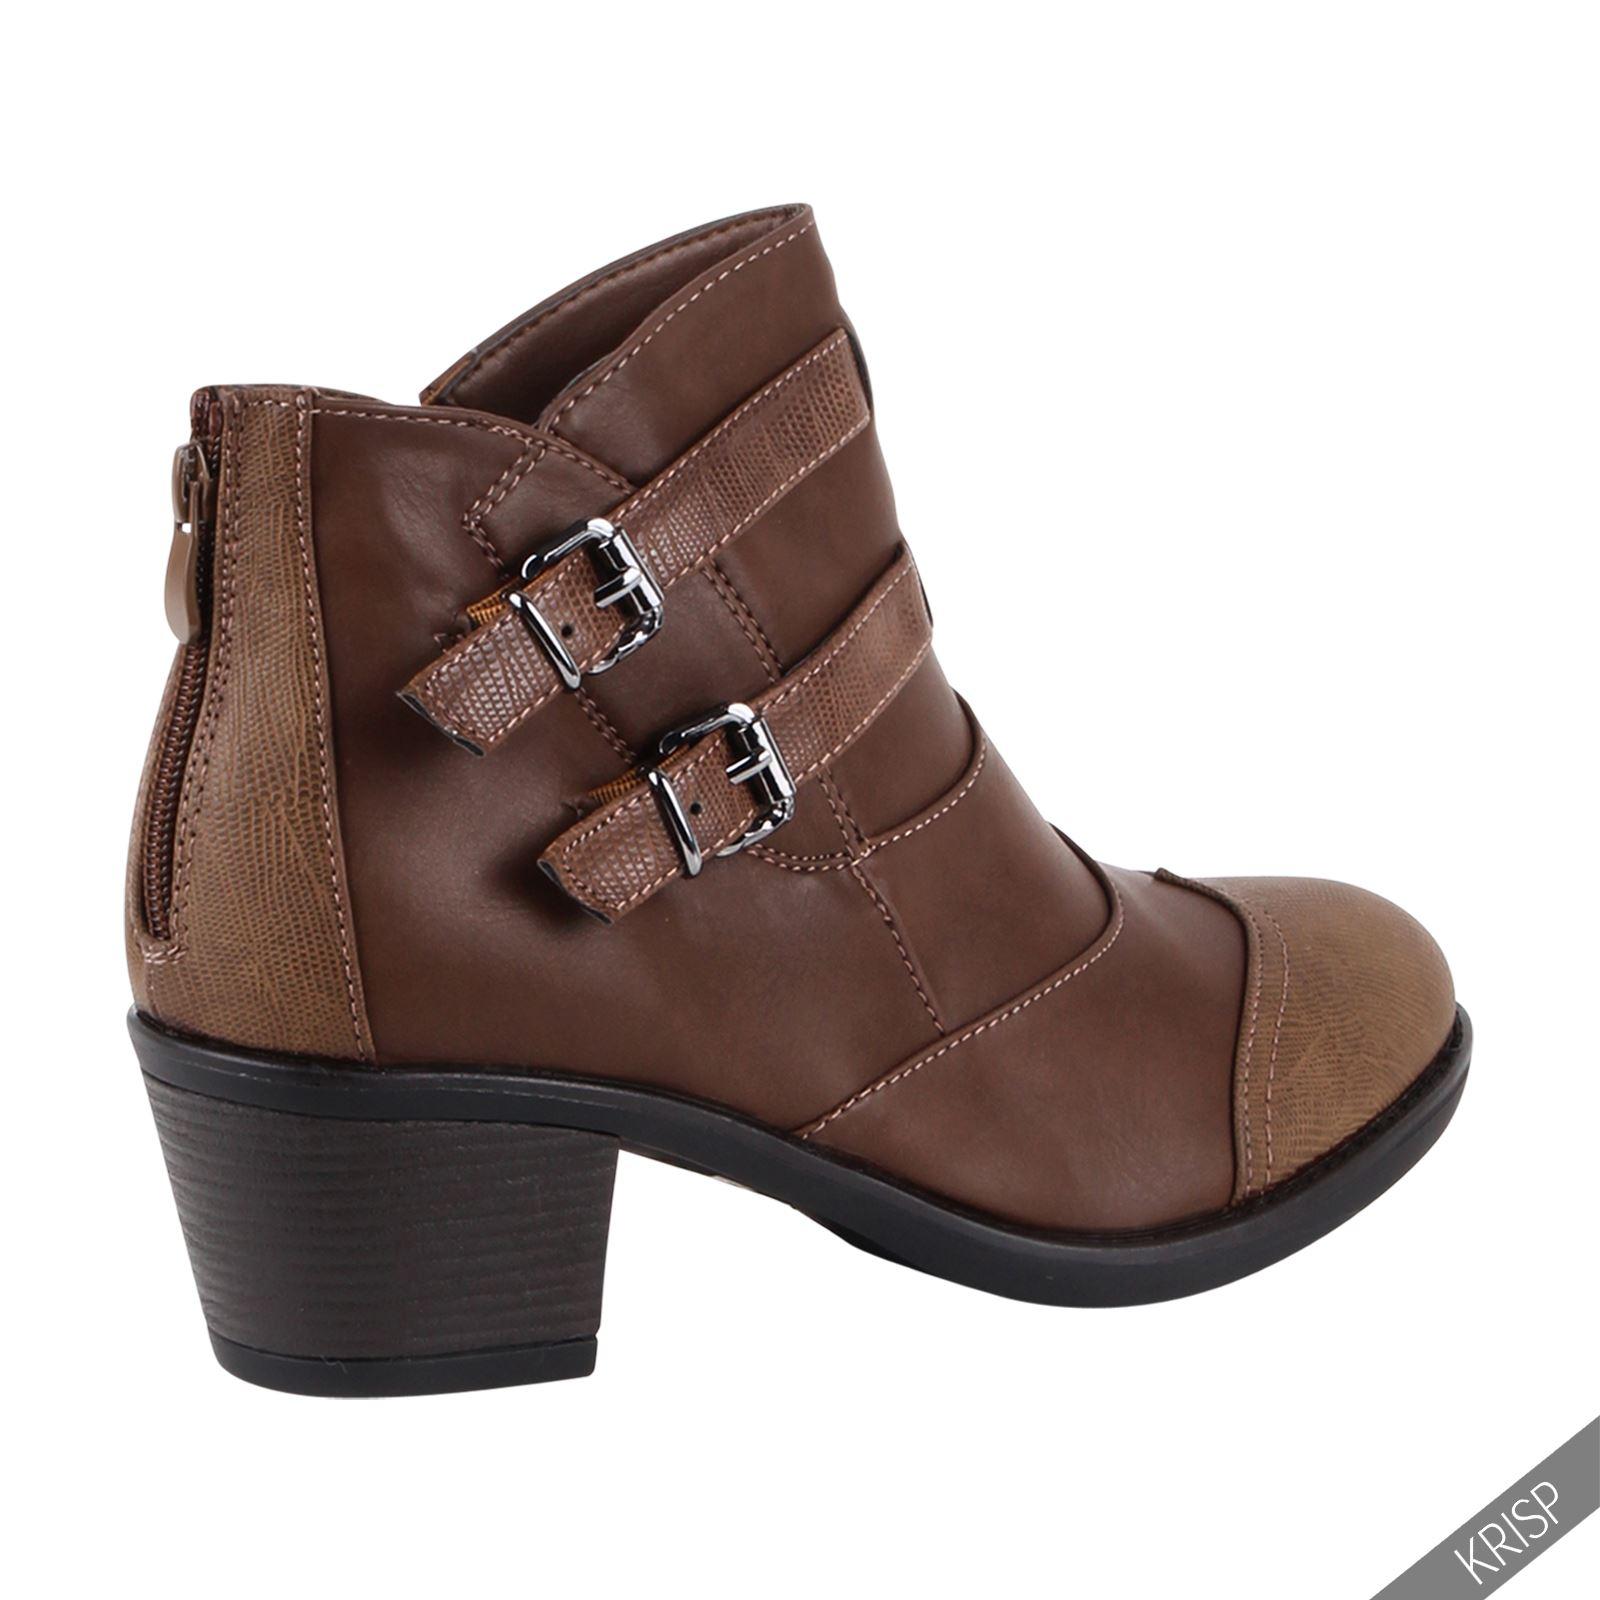 Excellent Womens Ladies Vintage Lace Up Low Heel Brogue Ankle Boots Shoes Plus